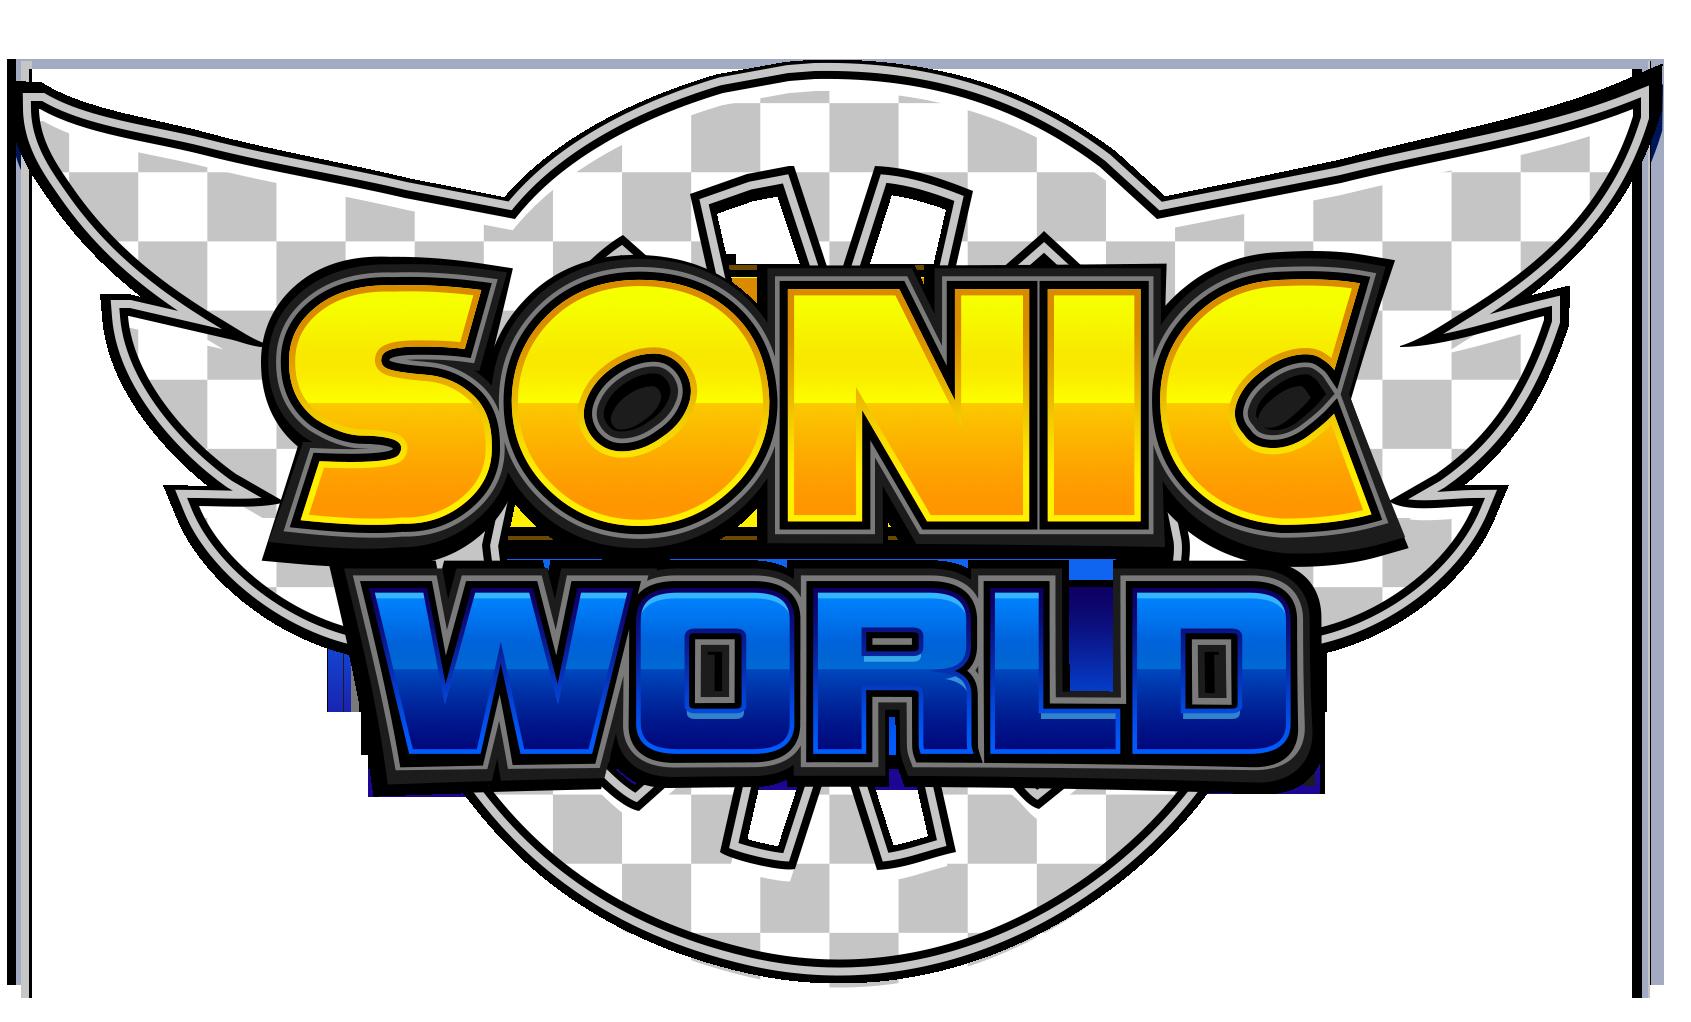 new sonic world logocommission by nuryrush on deviantart